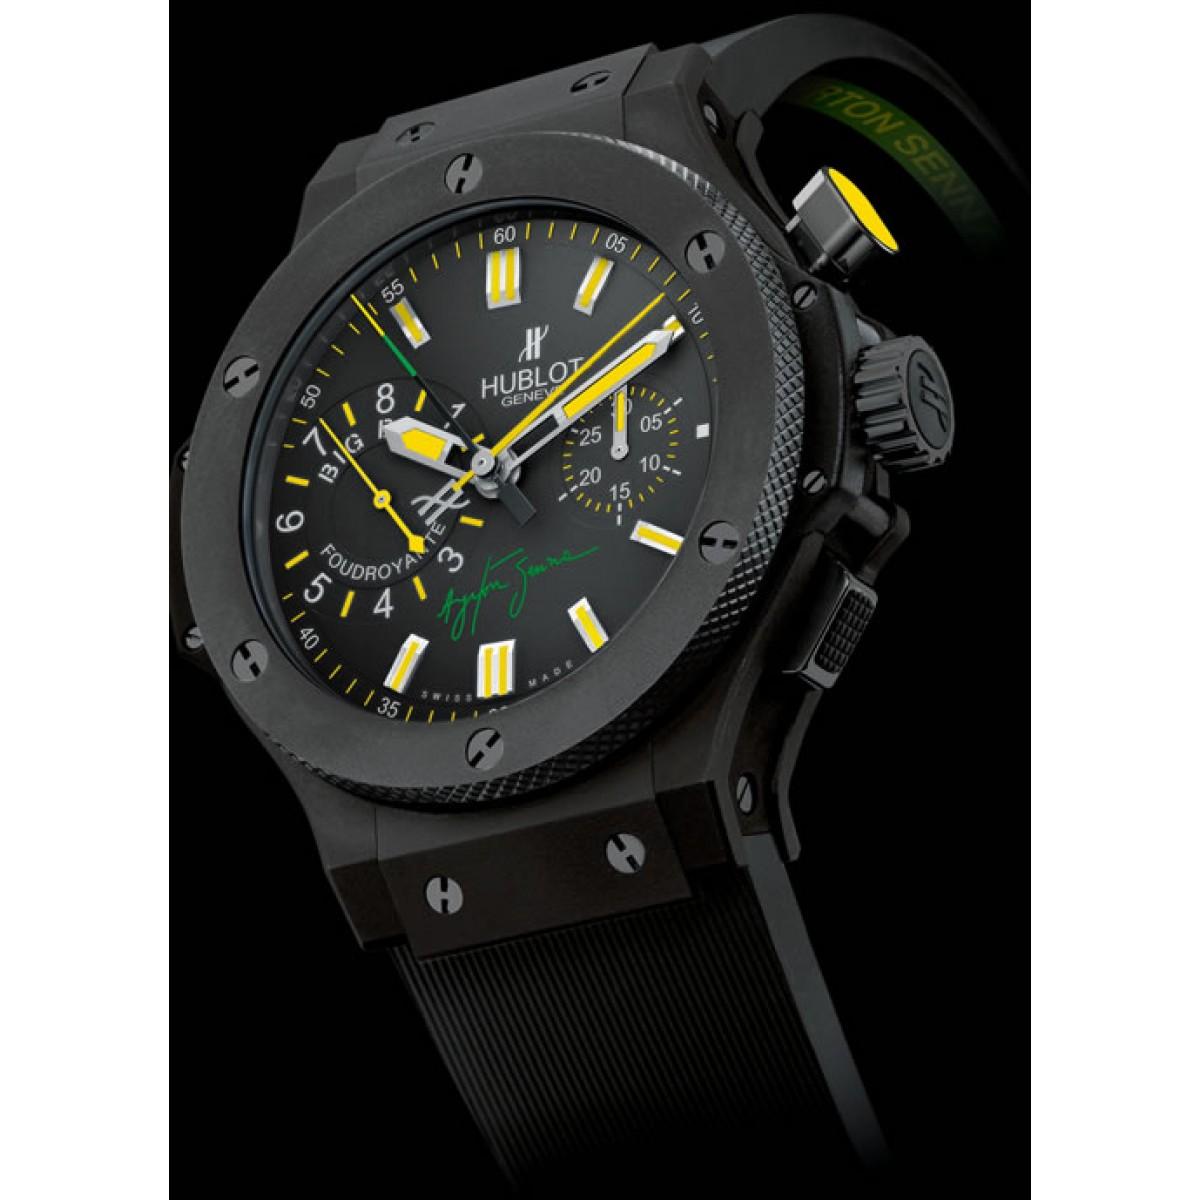 e1c76cb4bfd Relógio Réplica Hublot Ayrton Senna